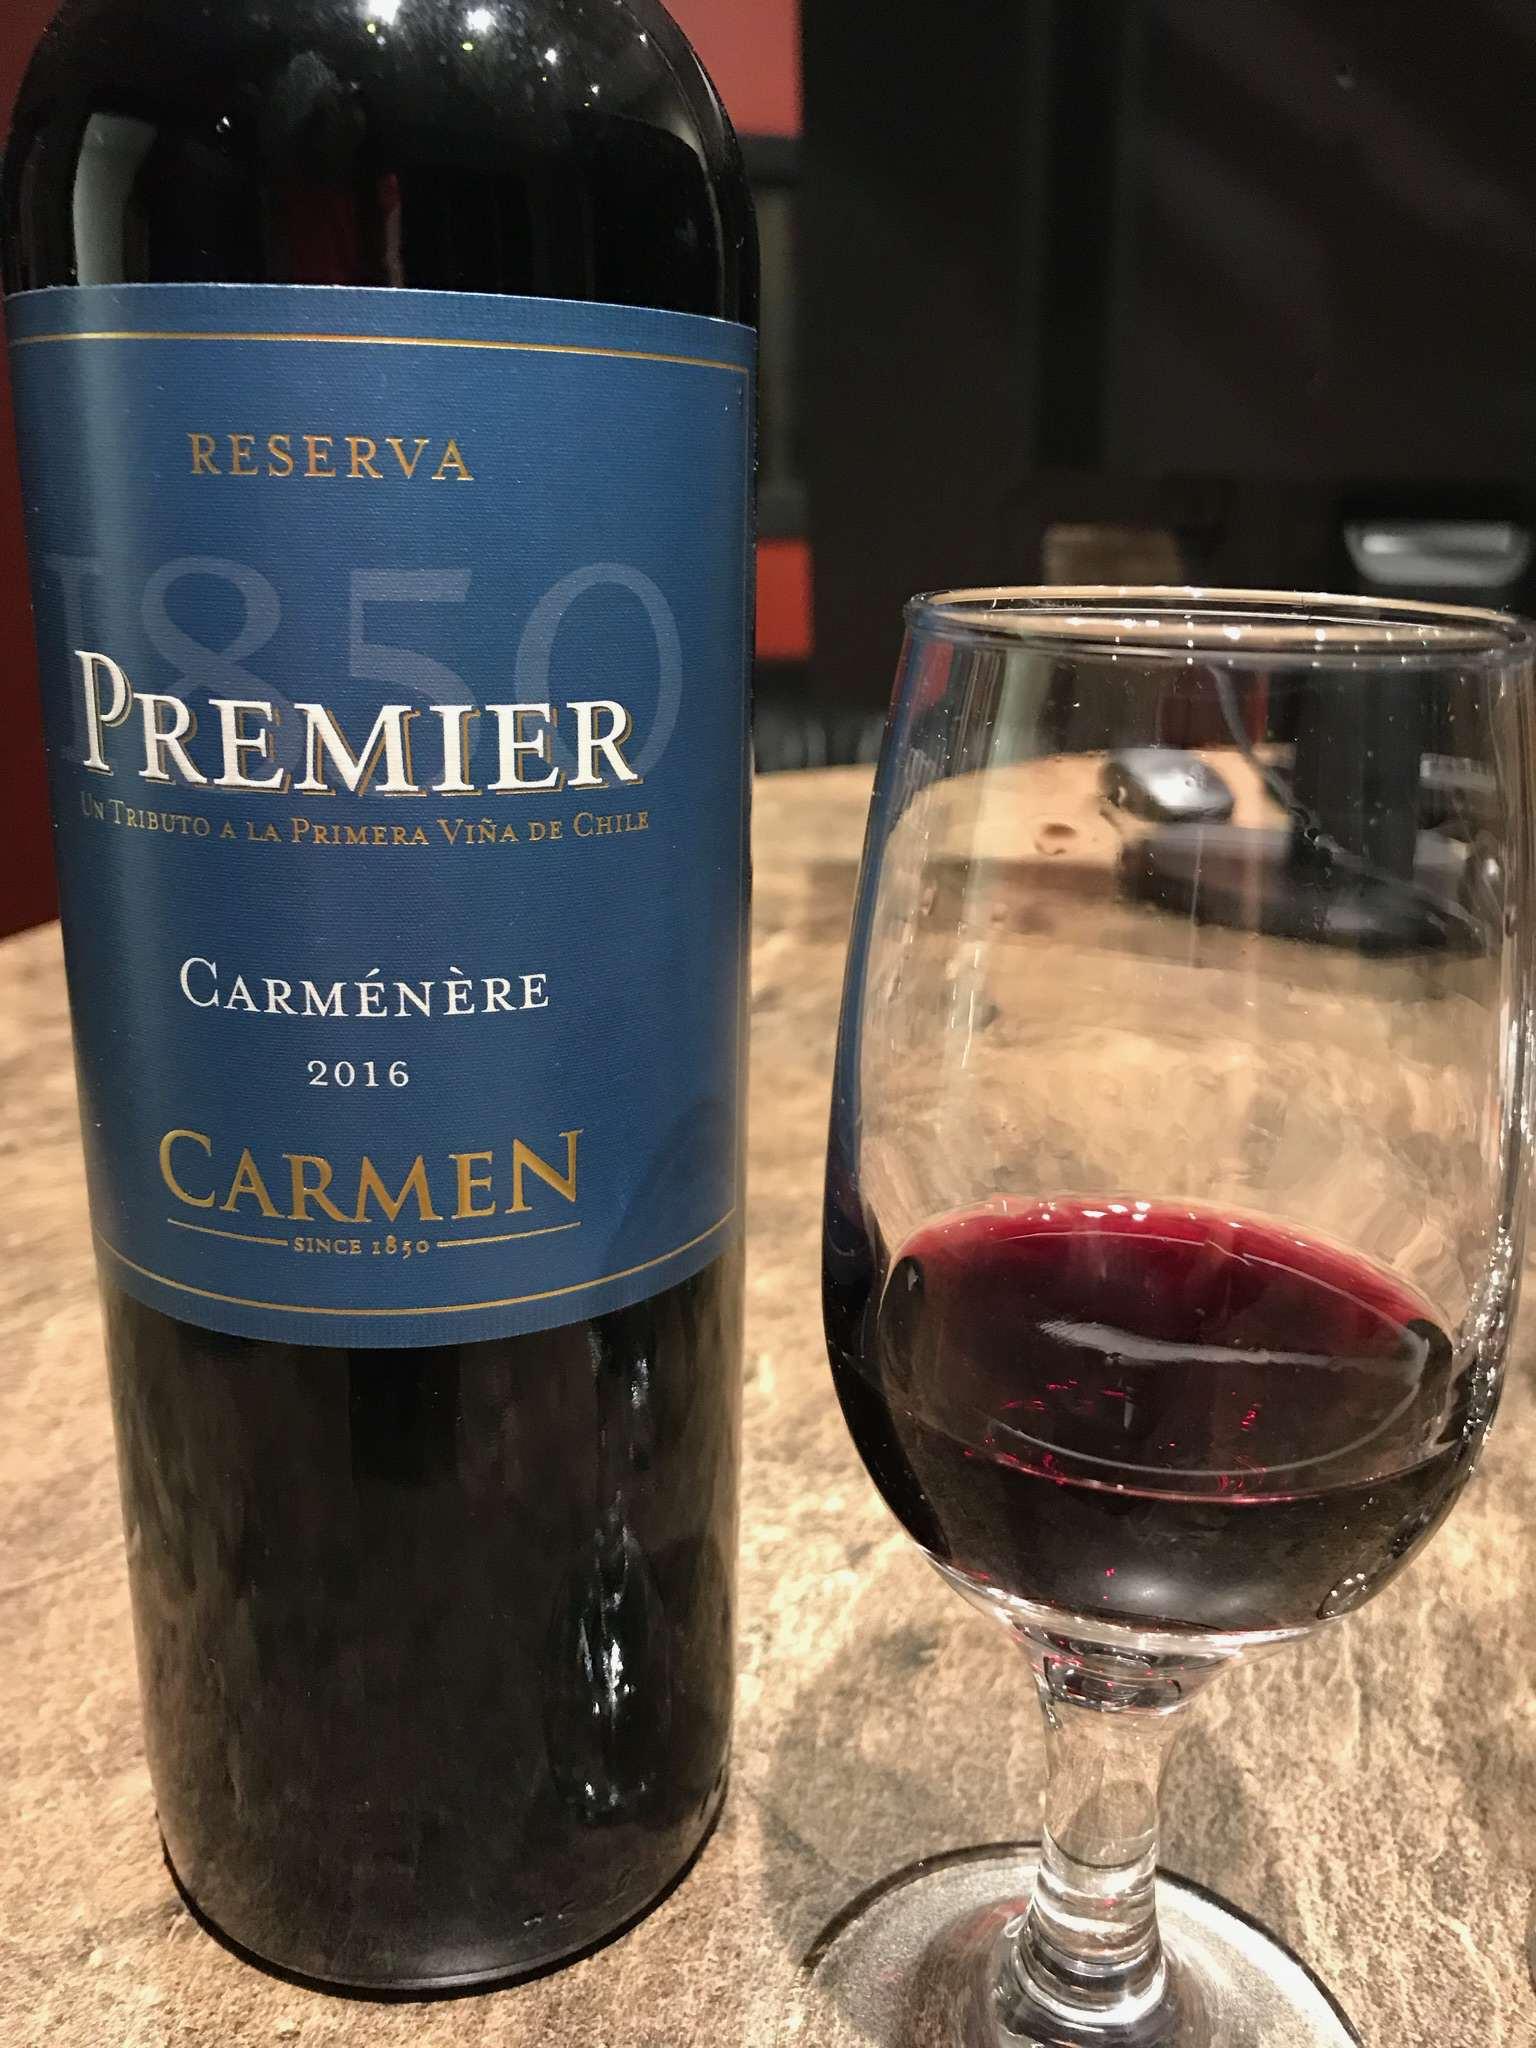 Kết quả hình ảnh cho CARMEN PREMIER CARMENERE